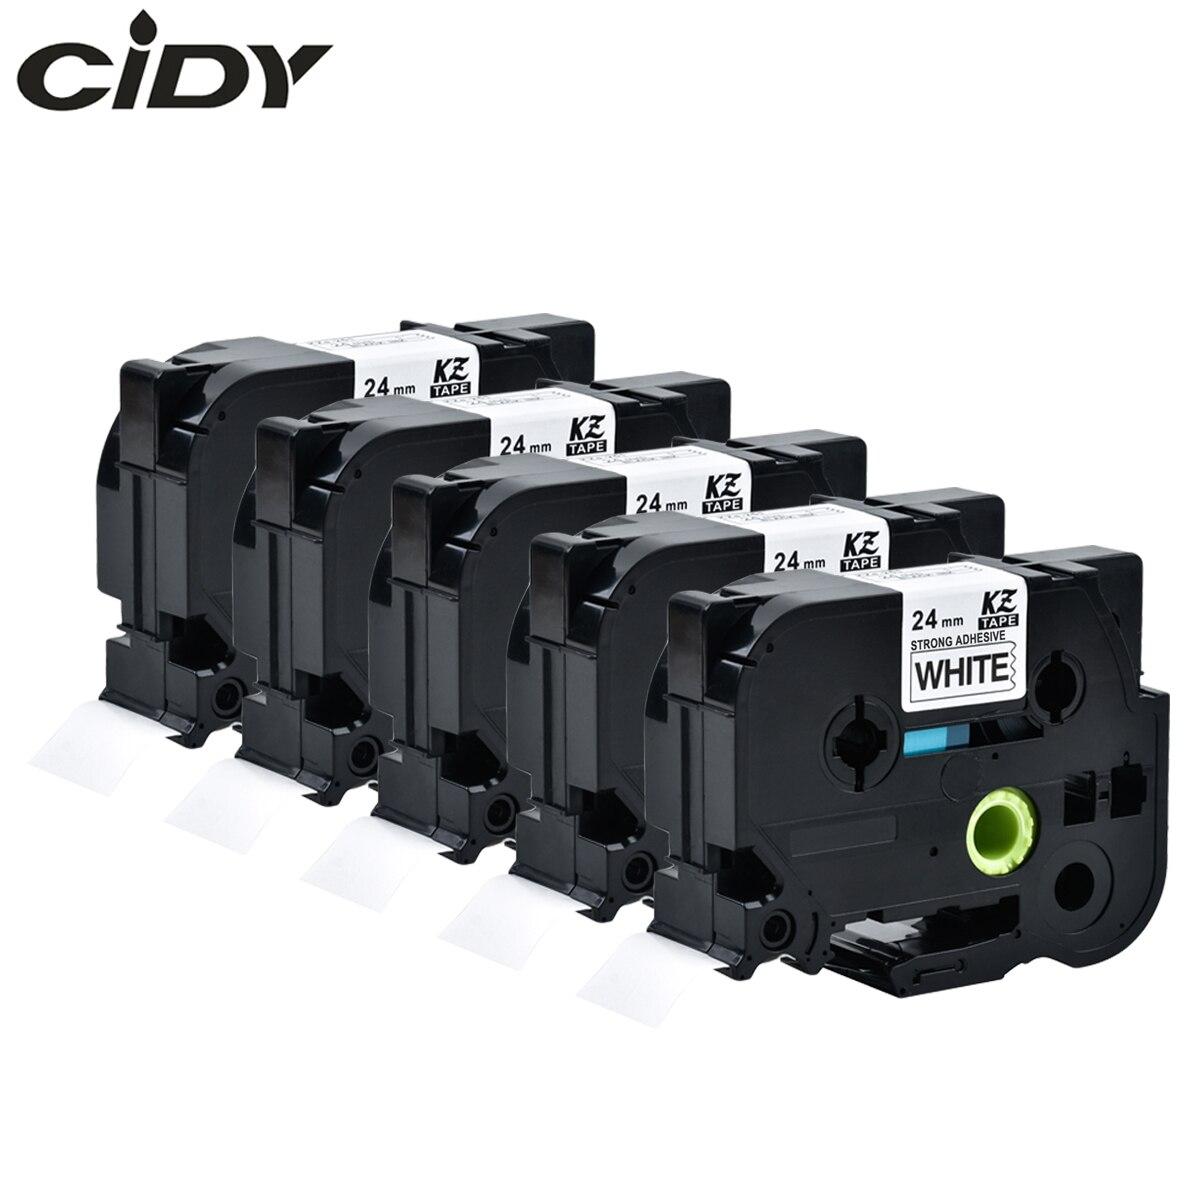 Cidy 5 قطع أسود على أبيض قوي لاصق TZe-S251 tz-S251 s251 تزي متوافق الأخ طابعة tz ف اتصال s251